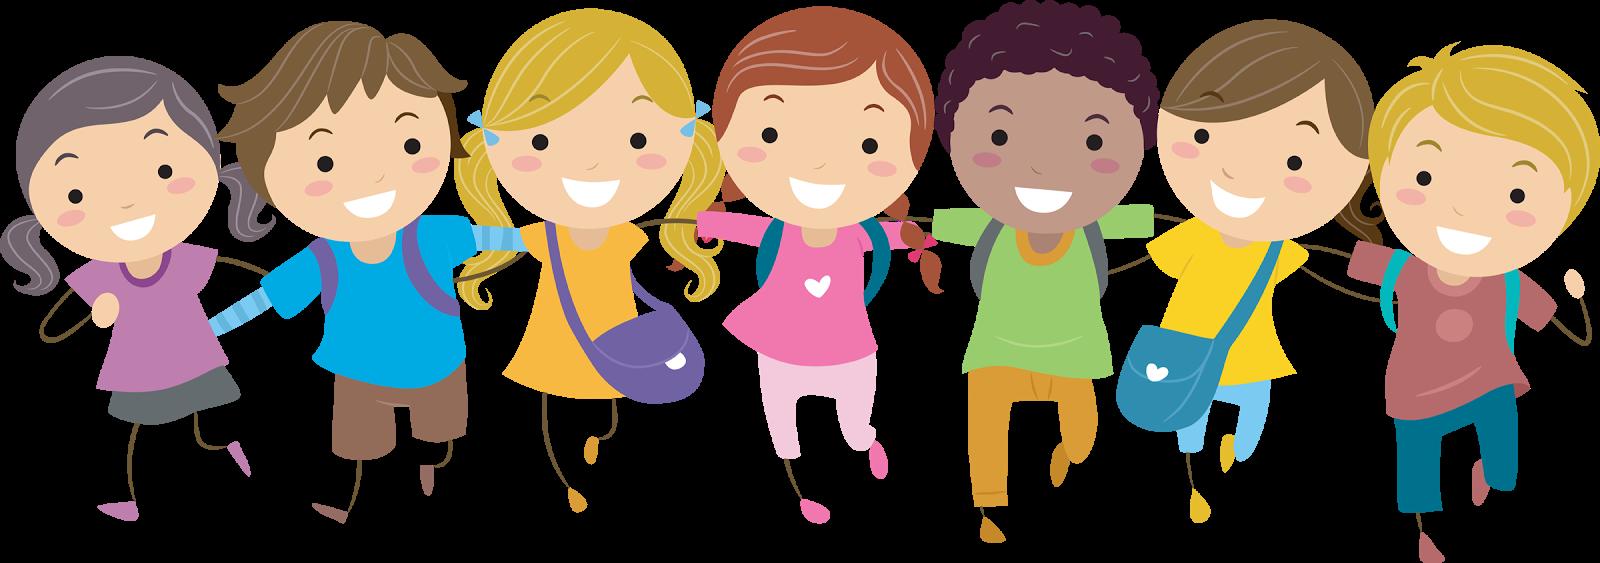 Kindergarten kids clipart jpg royalty free stock Kindergarten Boy Clipart - Clipart Kid jpg royalty free stock